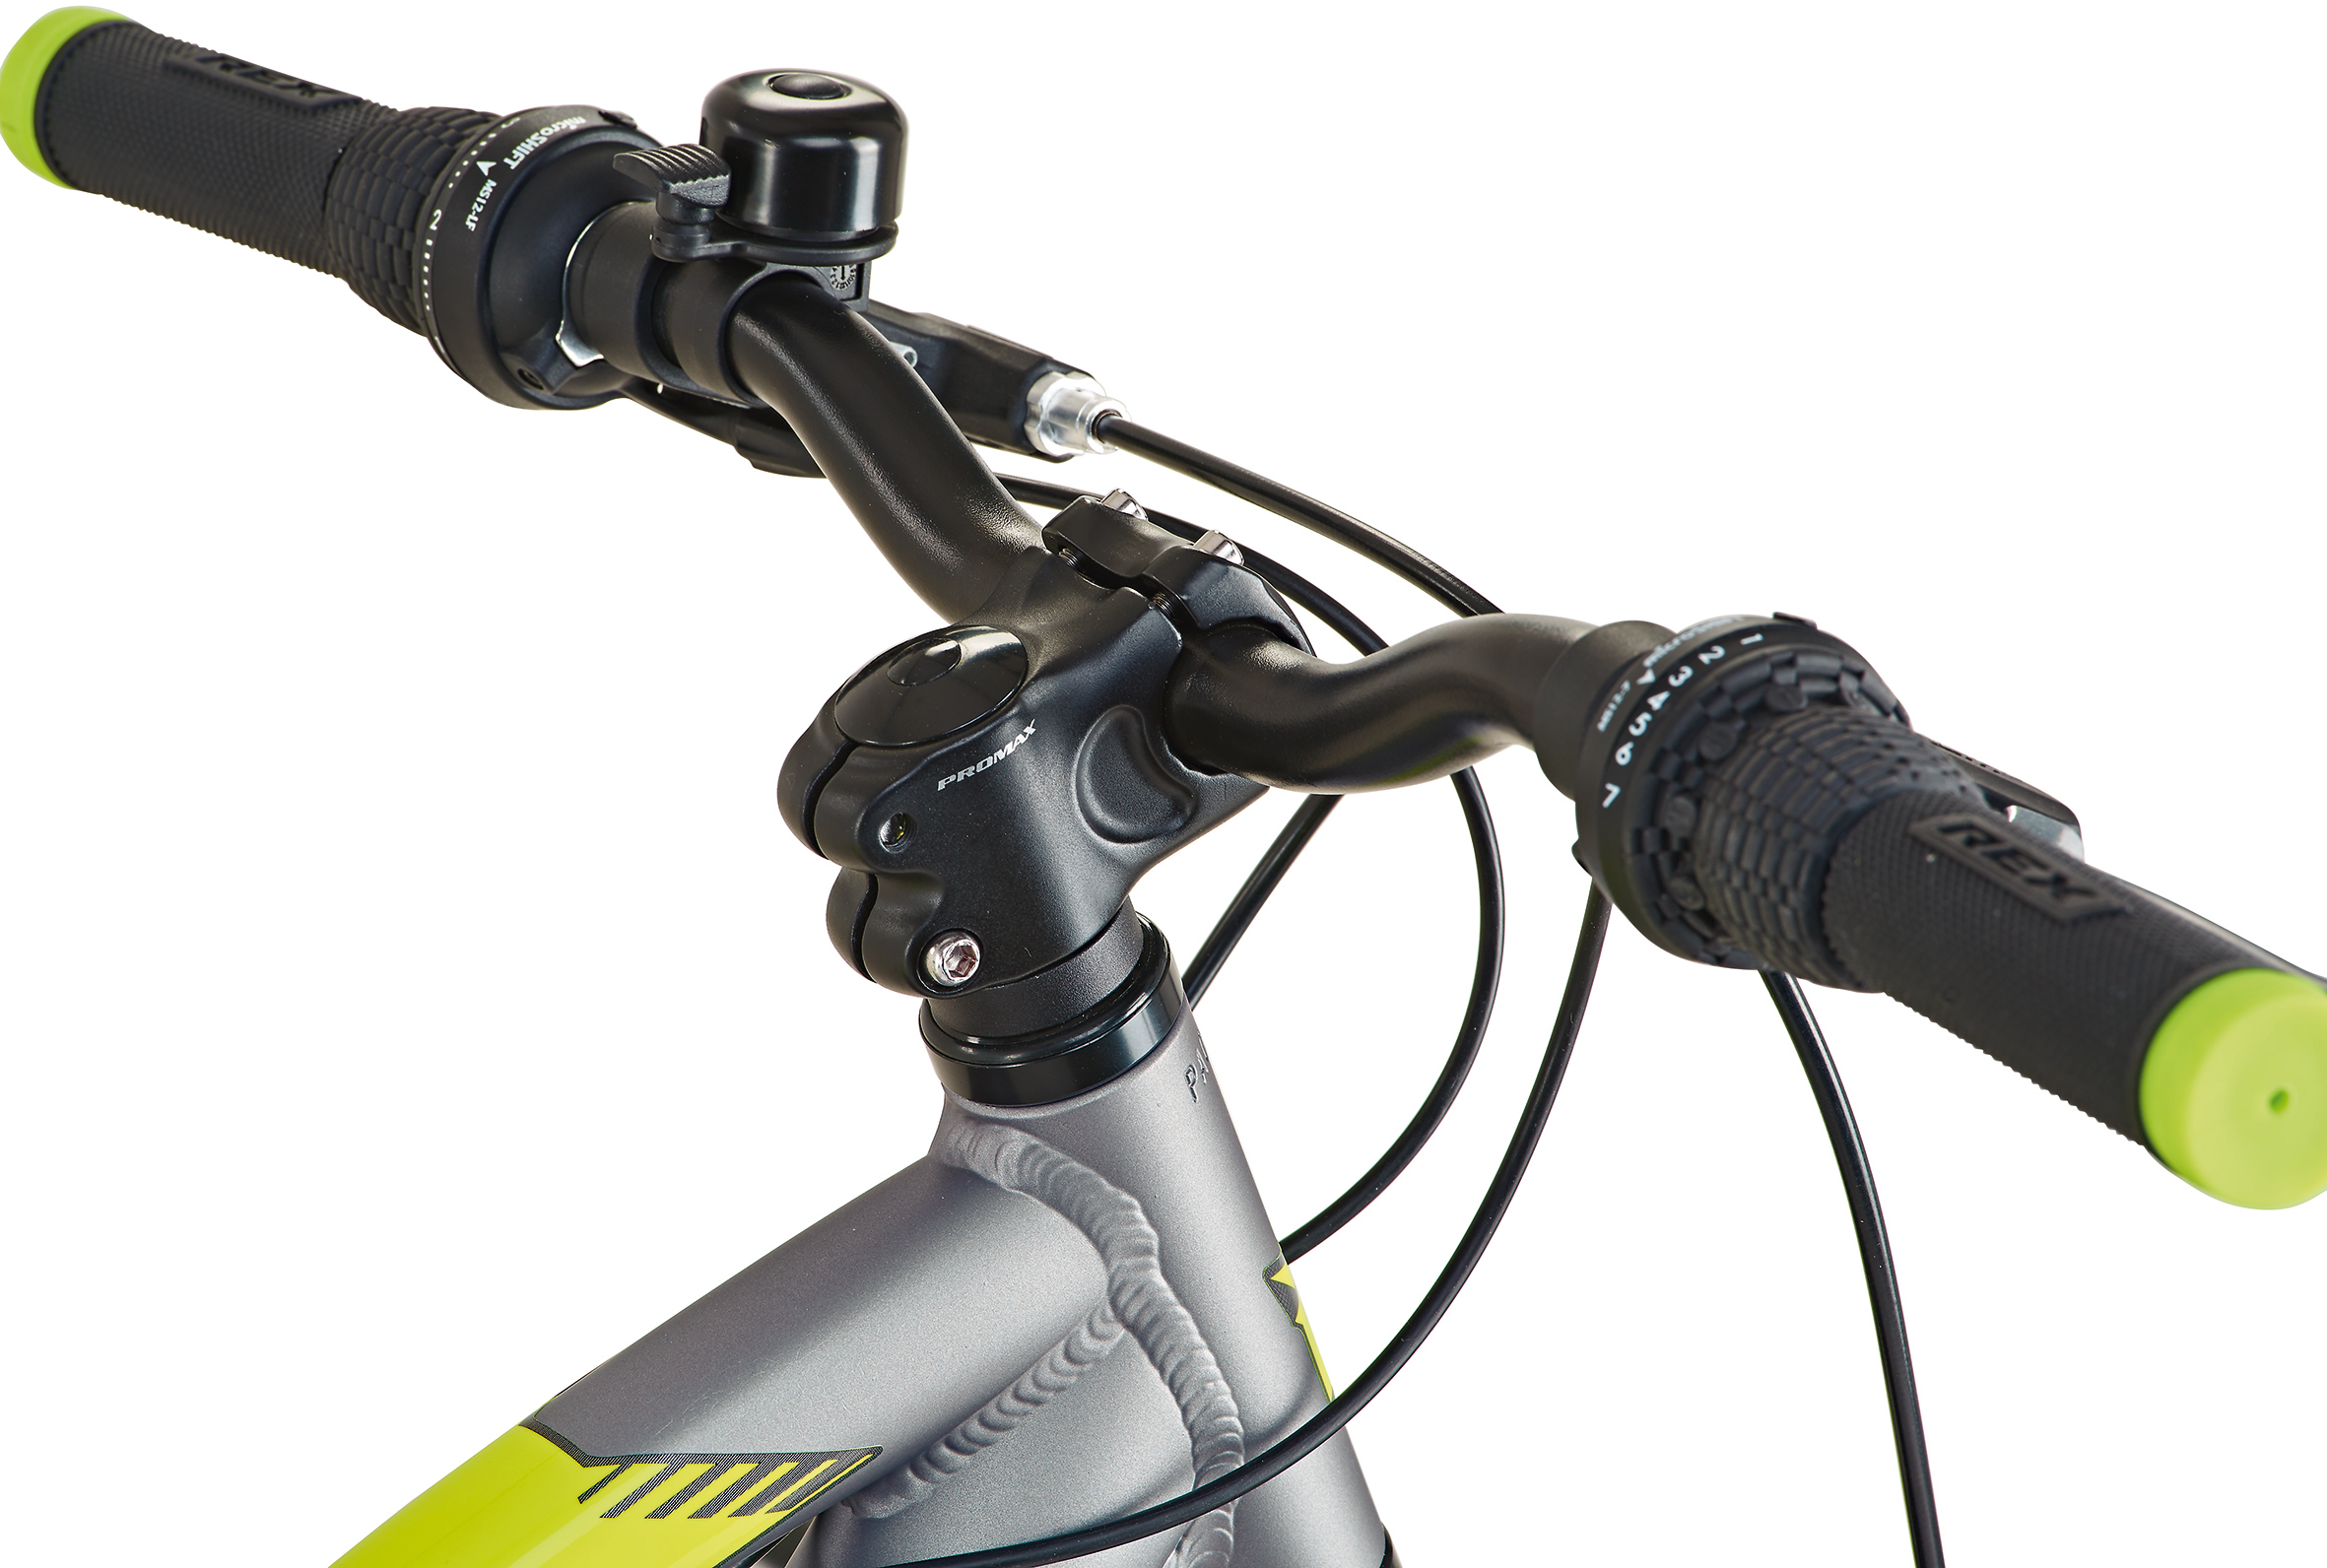 "Rex Bike Jugendfahrrad / Graveler Twentyfour Kids Bike 24"" Bild 3"